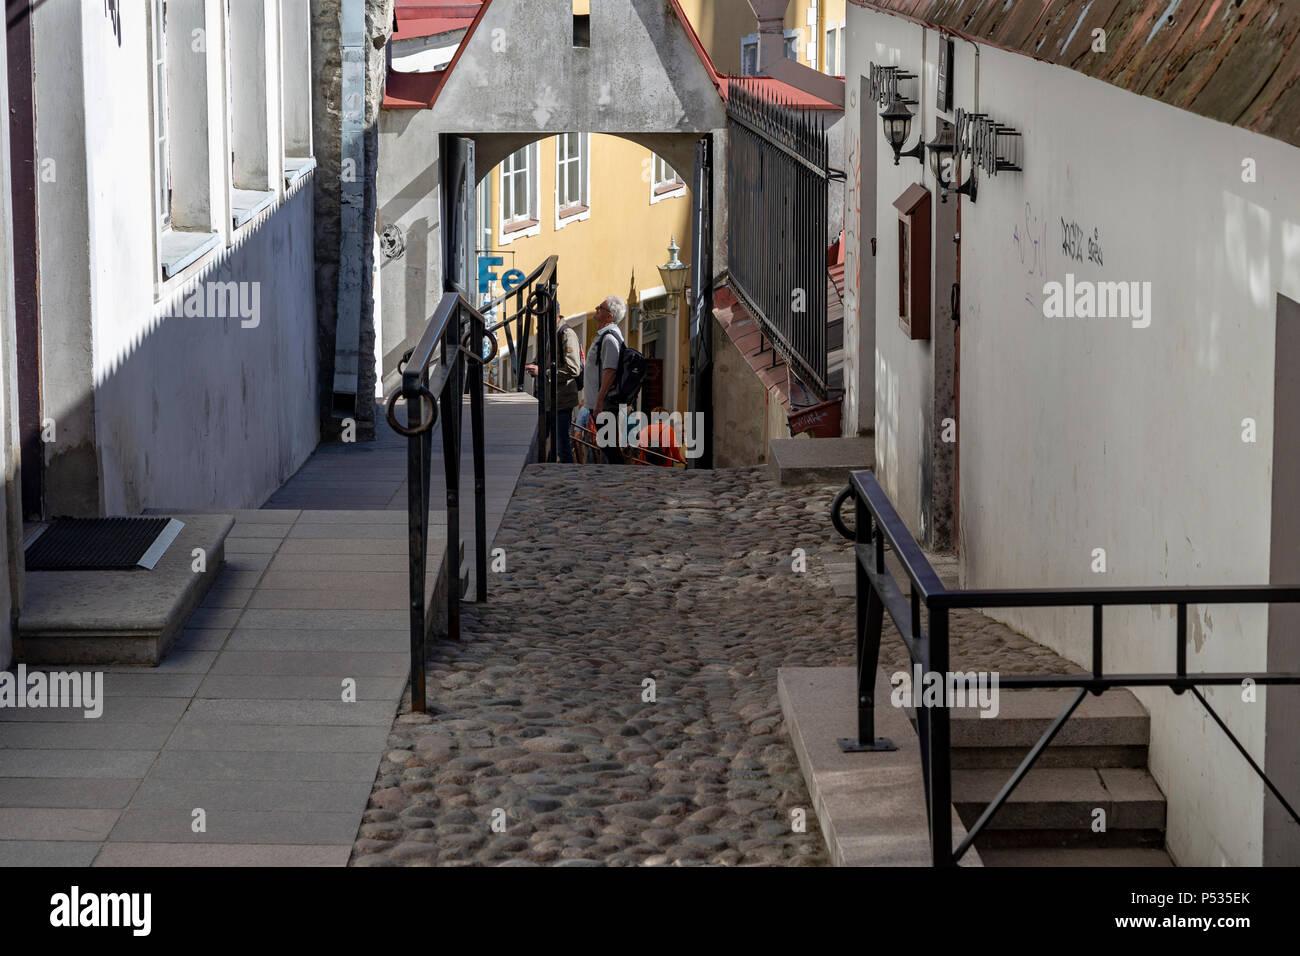 Street view in Tallin, Estonia - Stock Image